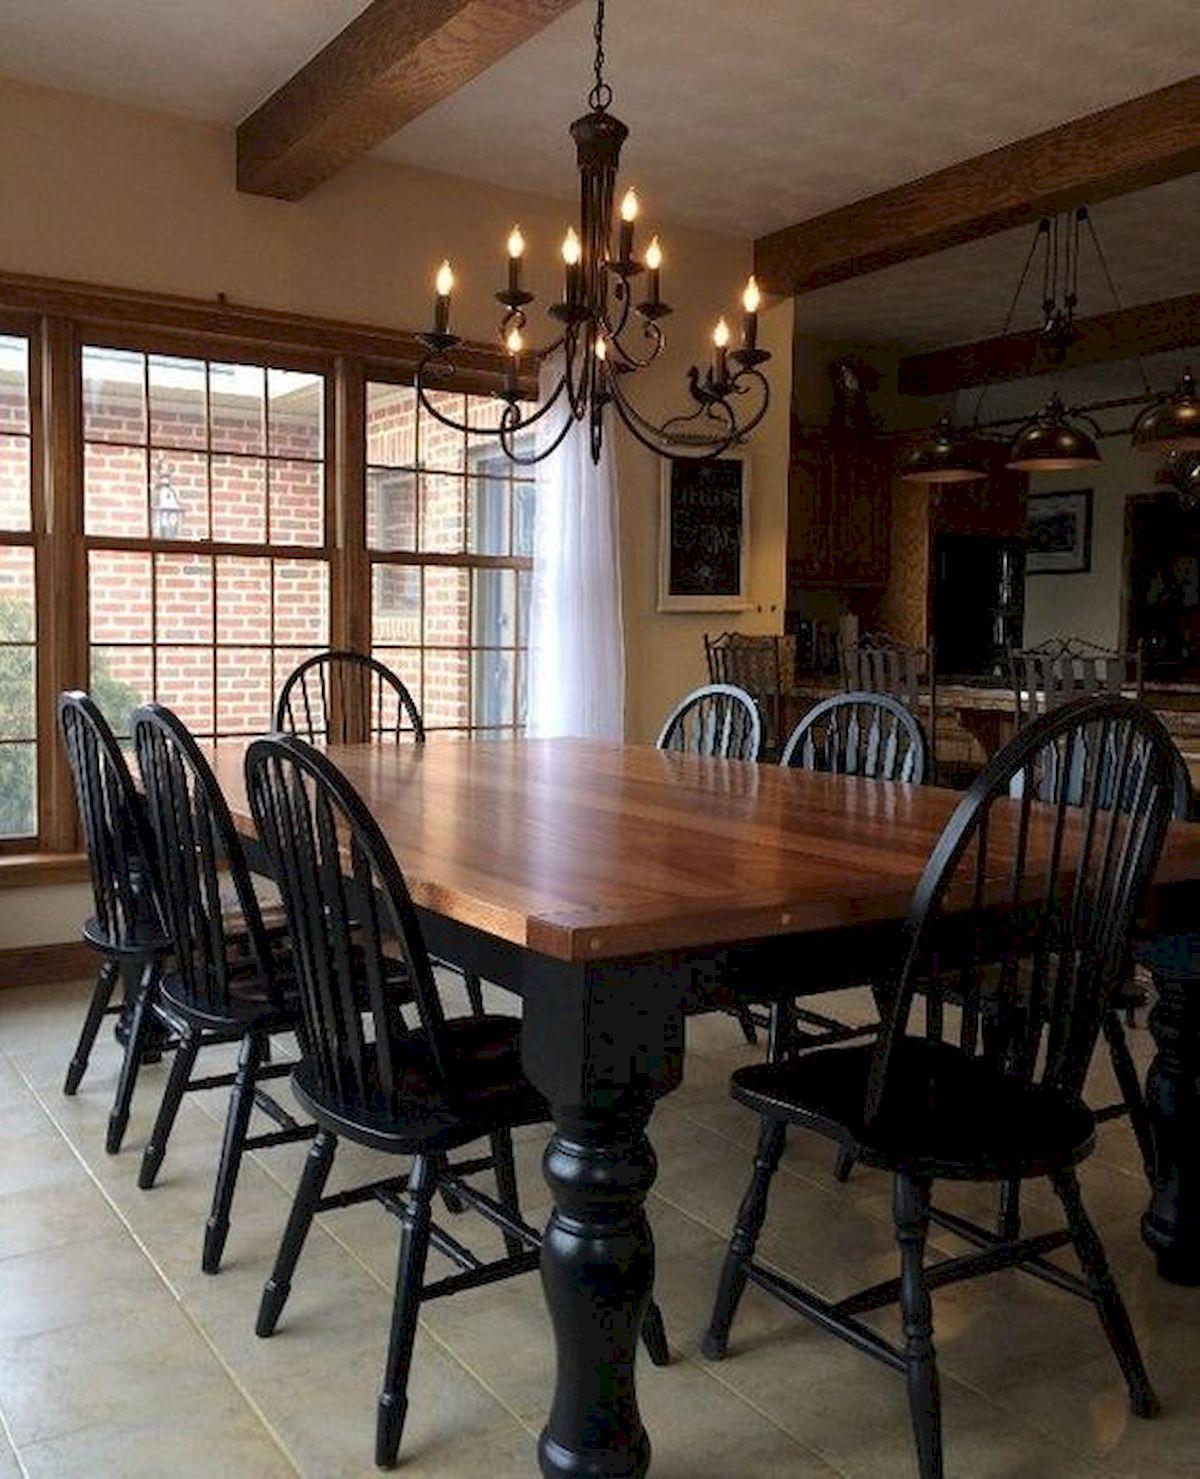 40 Adorable Farmhouse Dining Room Design And Decor Ideas (24)